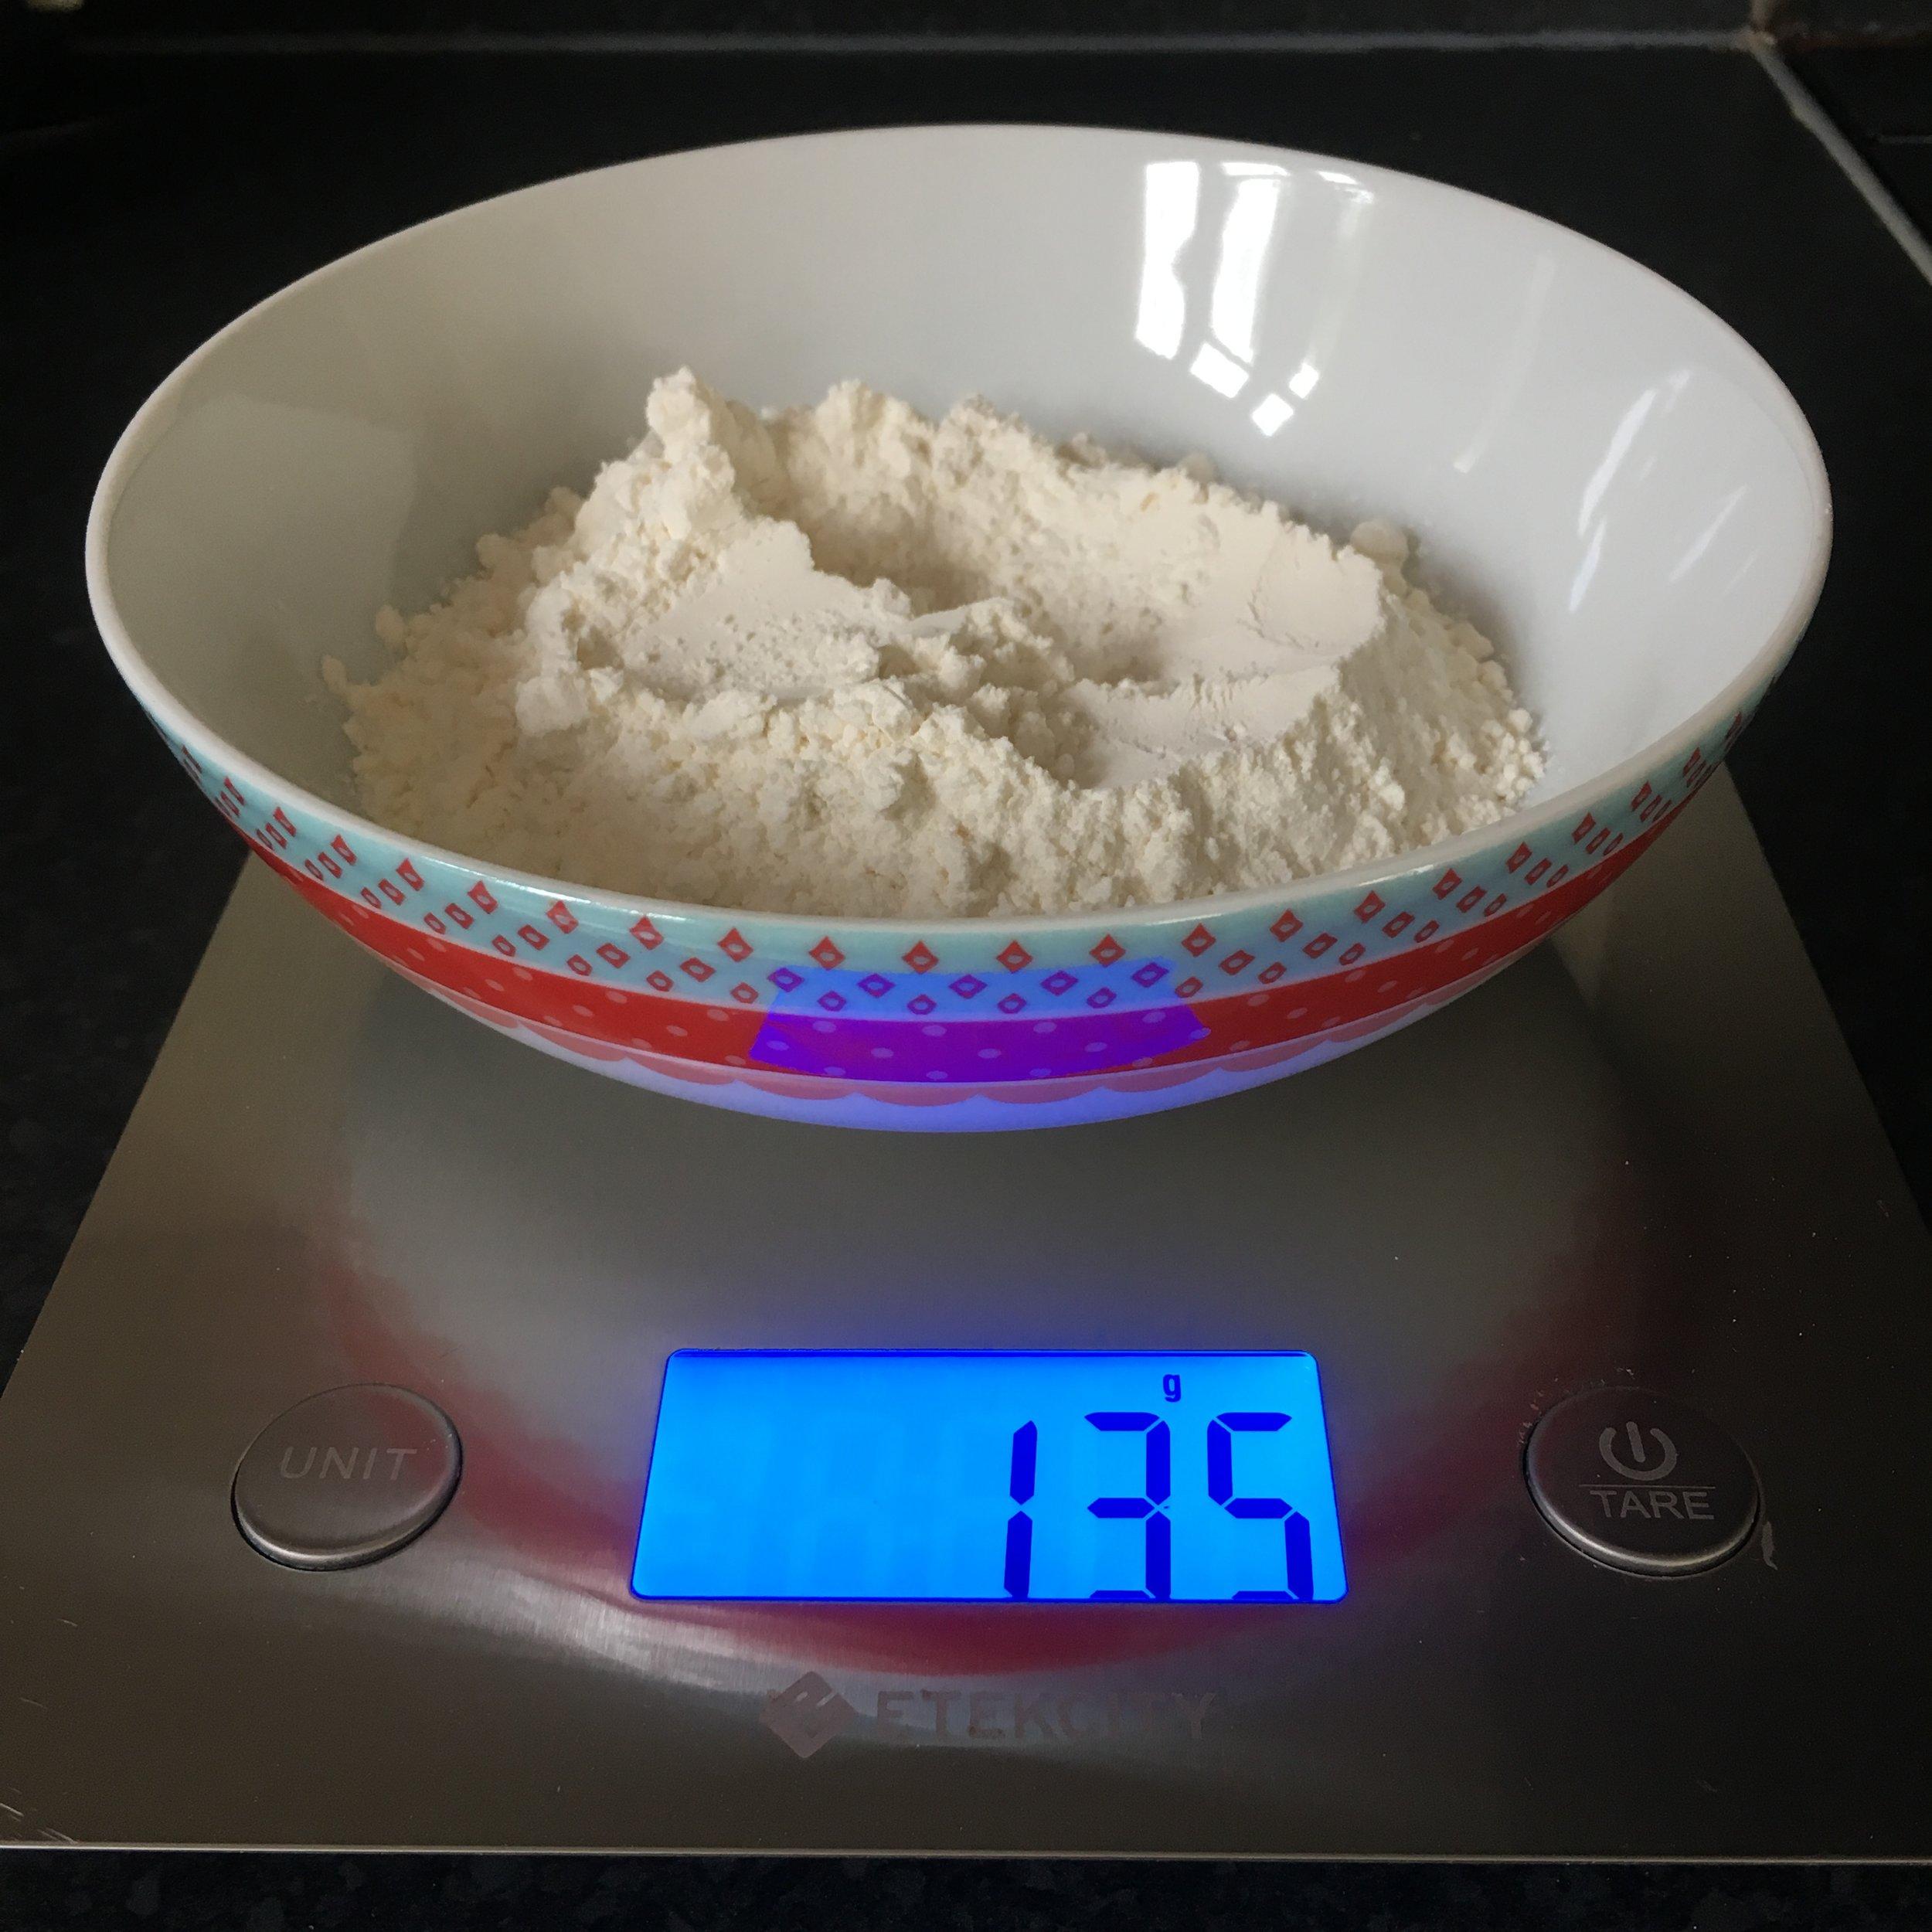 Weighing 135g of gluten free self raising flour